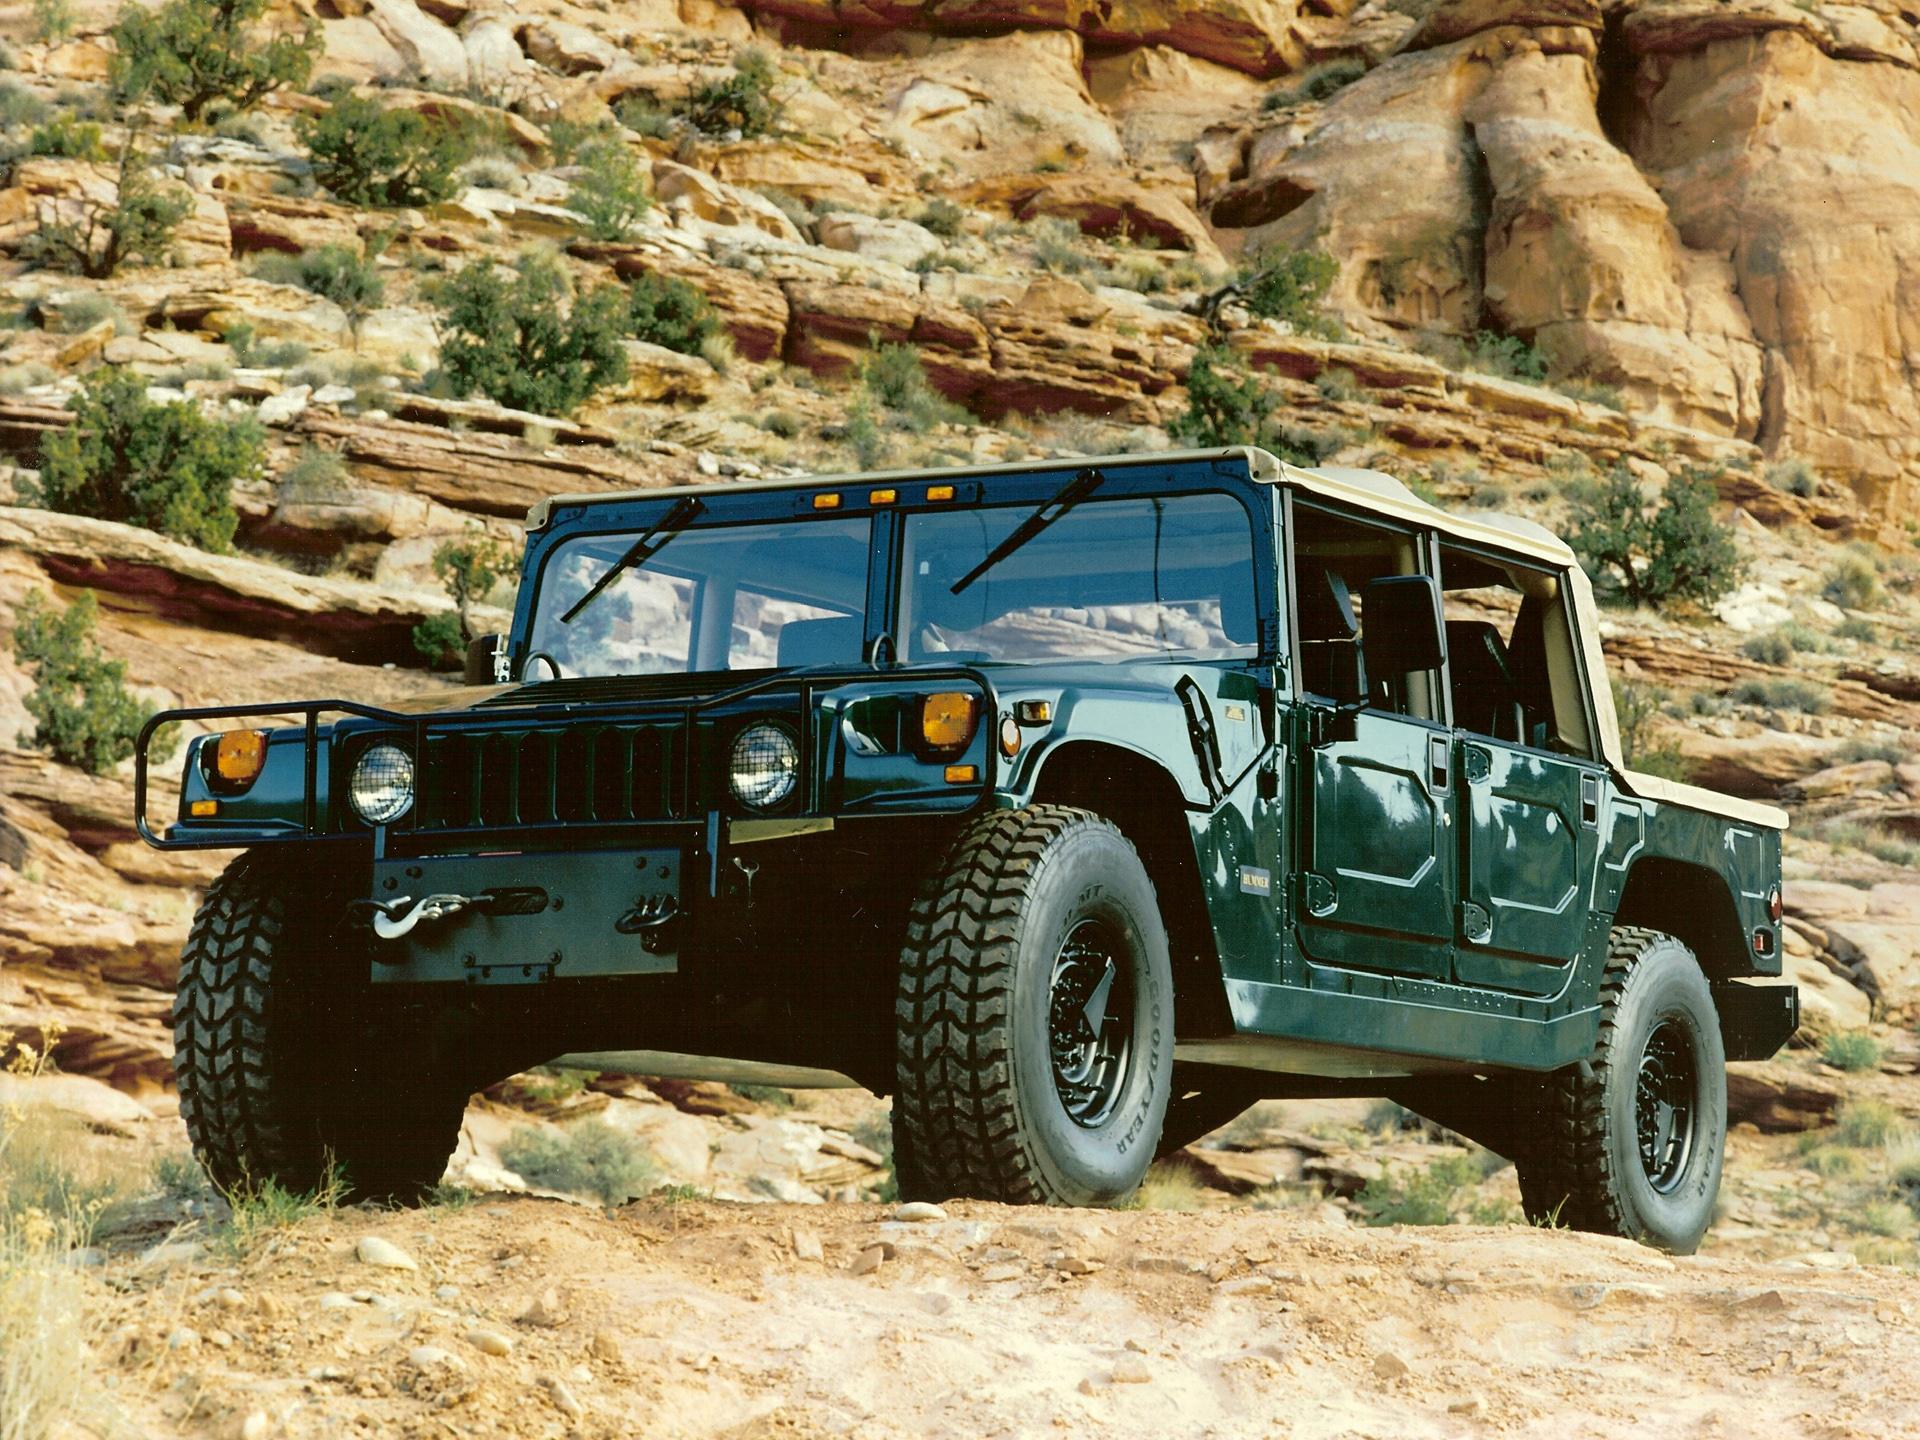 1993 Hummer H1 Vlco 4x4 Suv H 1 F Wallpaper 1920x1440